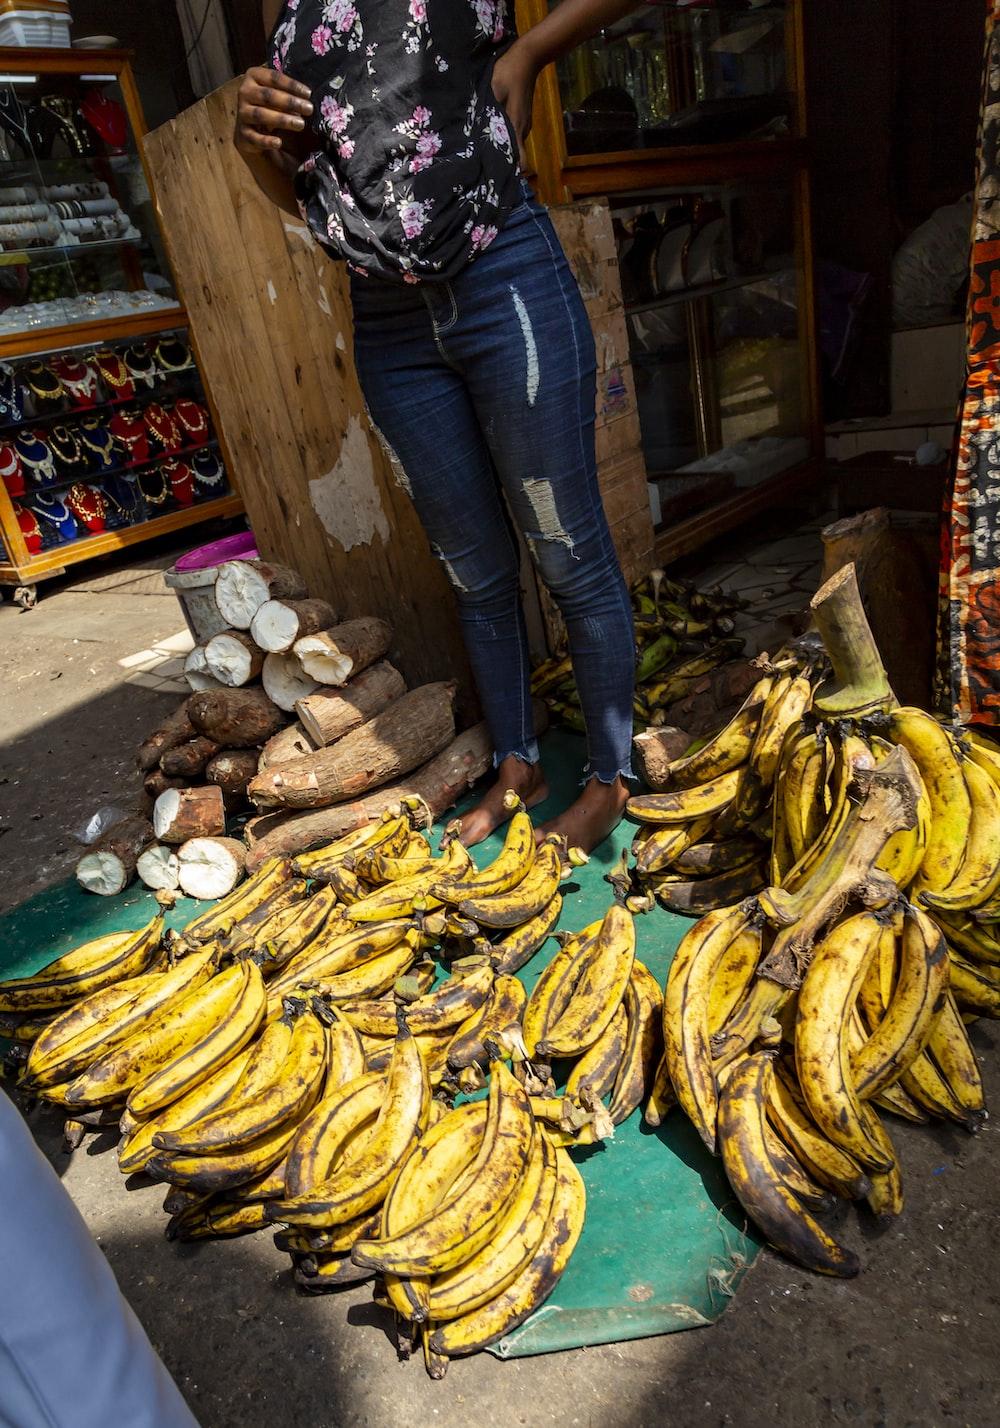 pile of yellow bananas